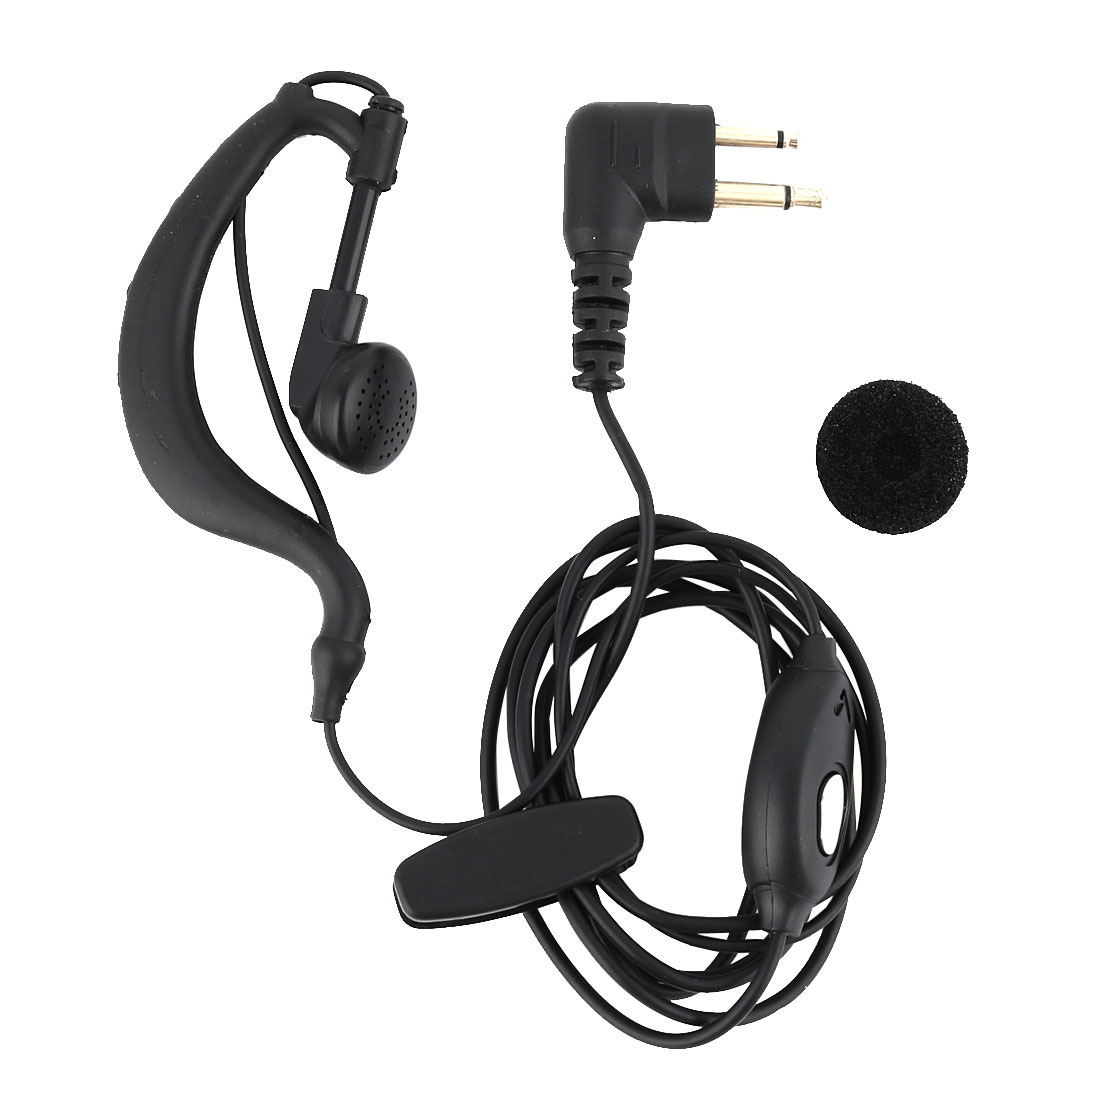 5mm Spacing Single Cord 2 Pin Jack Earphone Headset Earpiece for Motorola